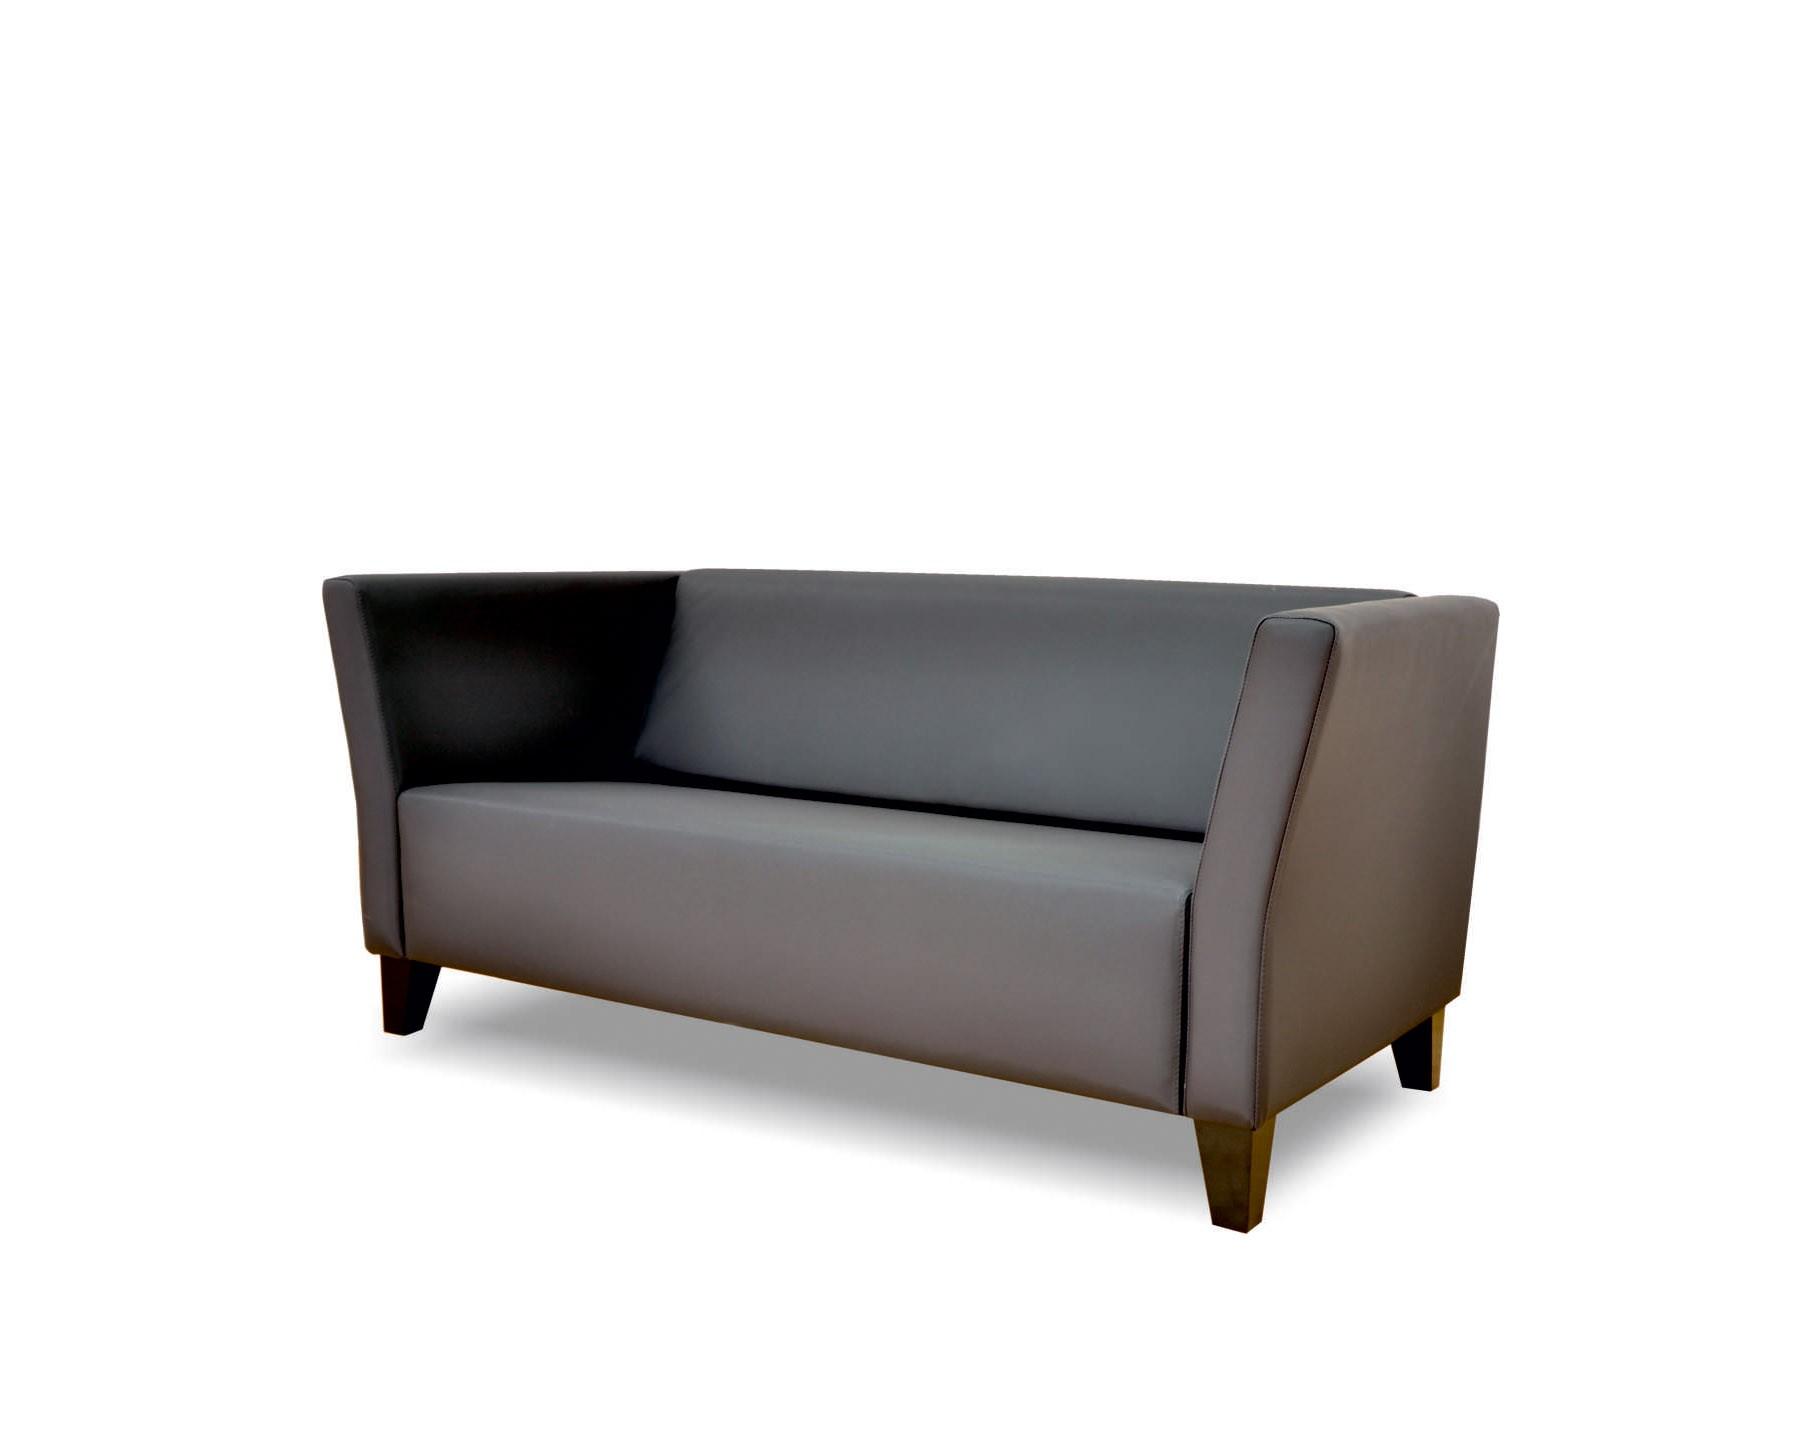 Altamura sofa naro na 300x240cm z lu nym pokrowcem i terminalem - Maison sofa altamura ...